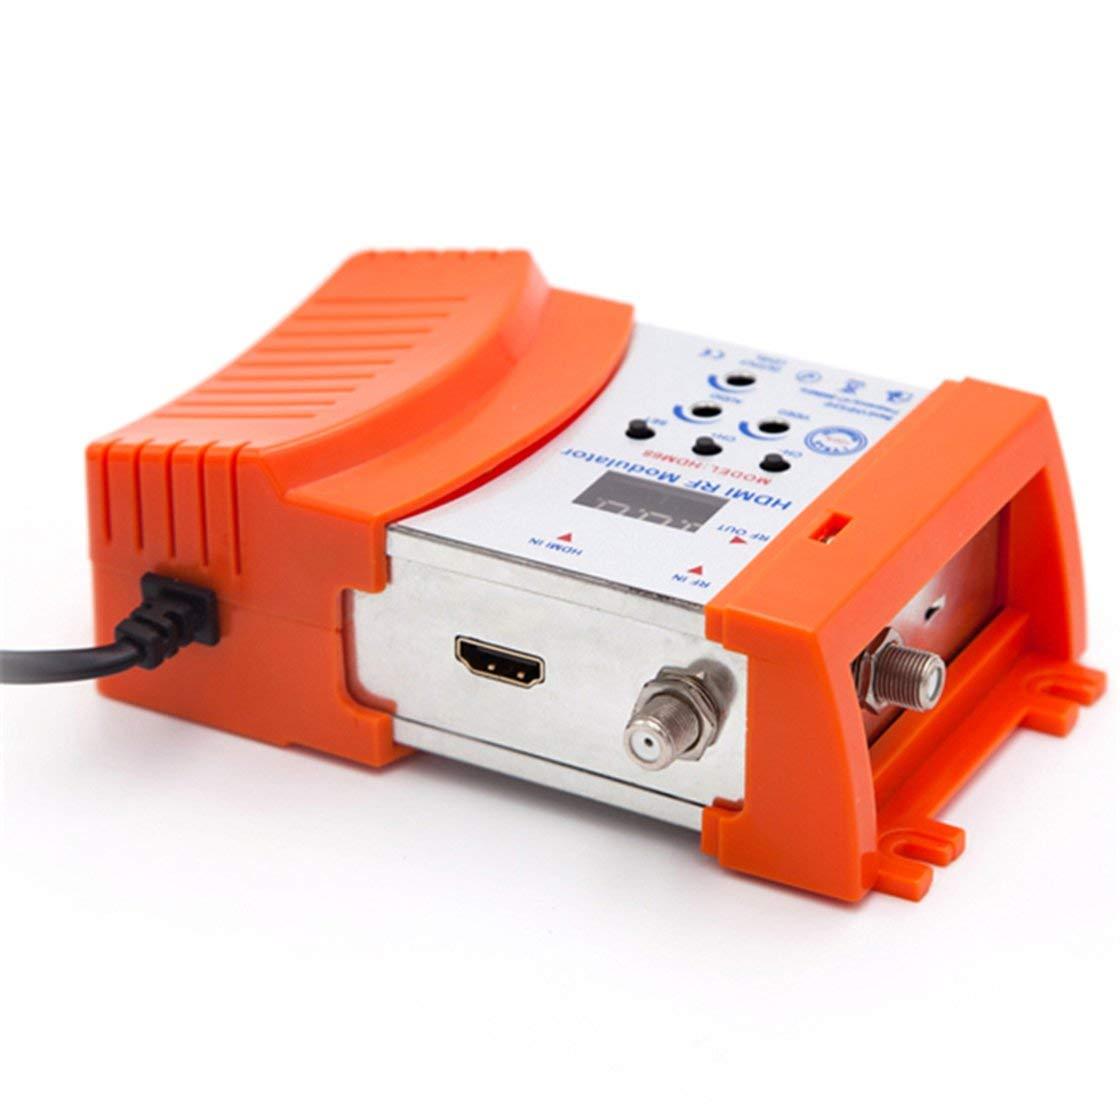 Modulador HDM68 RF Digital Modulador HDMI Convertidor AV a RF VHF UHF PAL//NTSC Modulador port/átil est/ándar